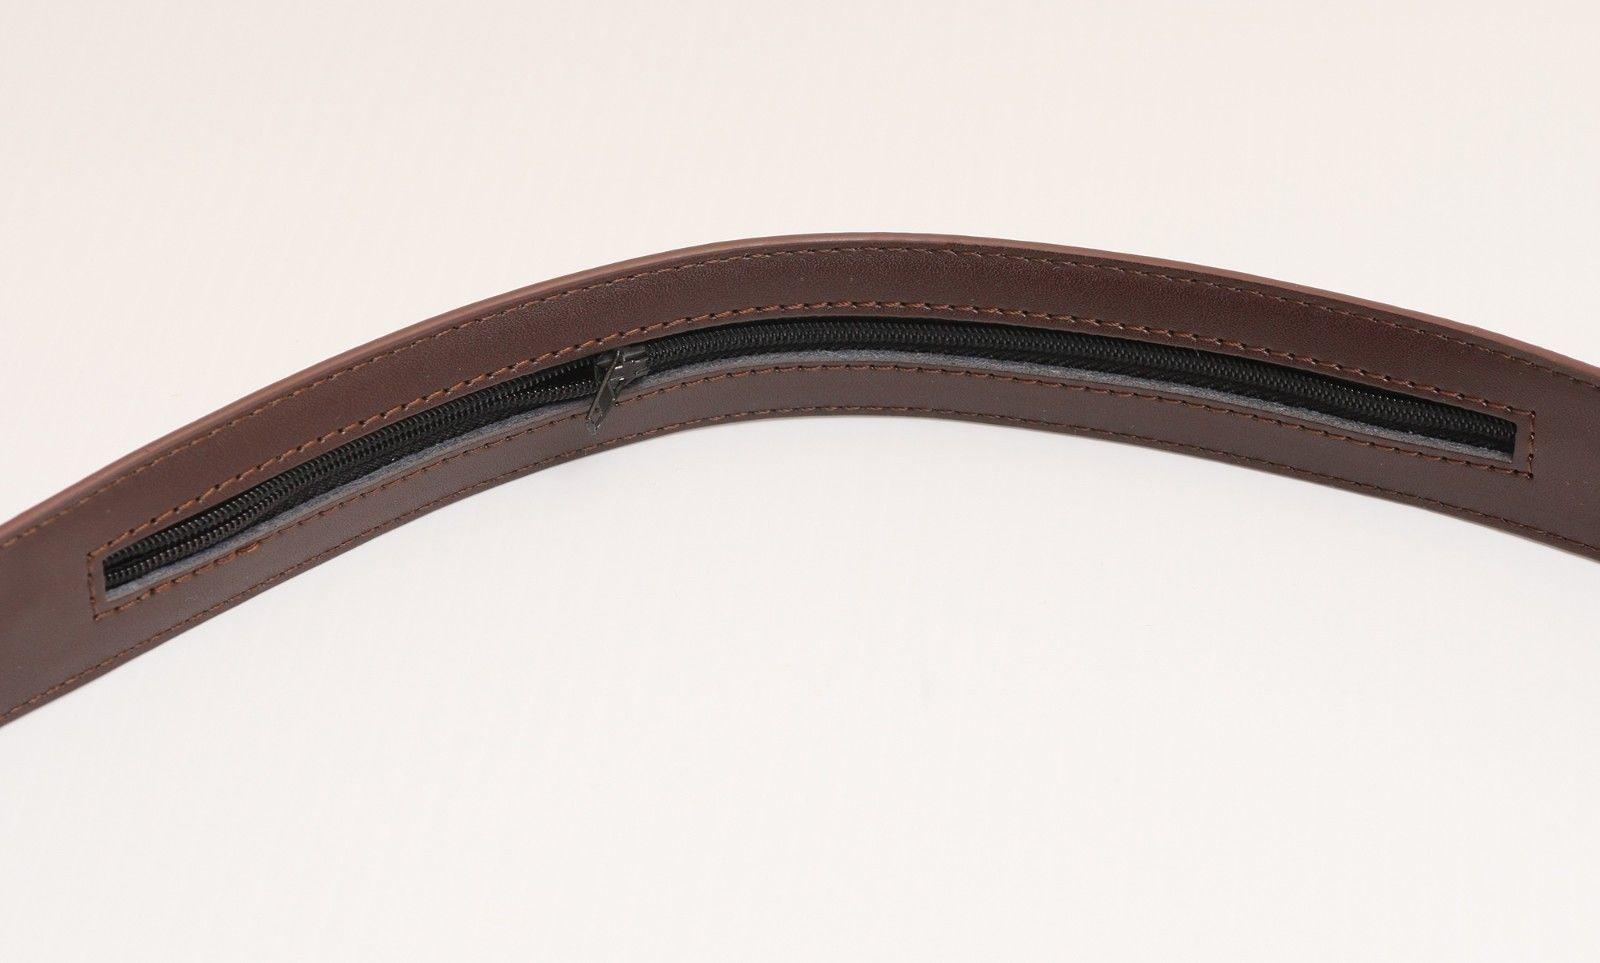 "MEN'S LEATHER MONEY BELT Travel Belt w/ Hidden Zipper Compartment 43"" Brown"